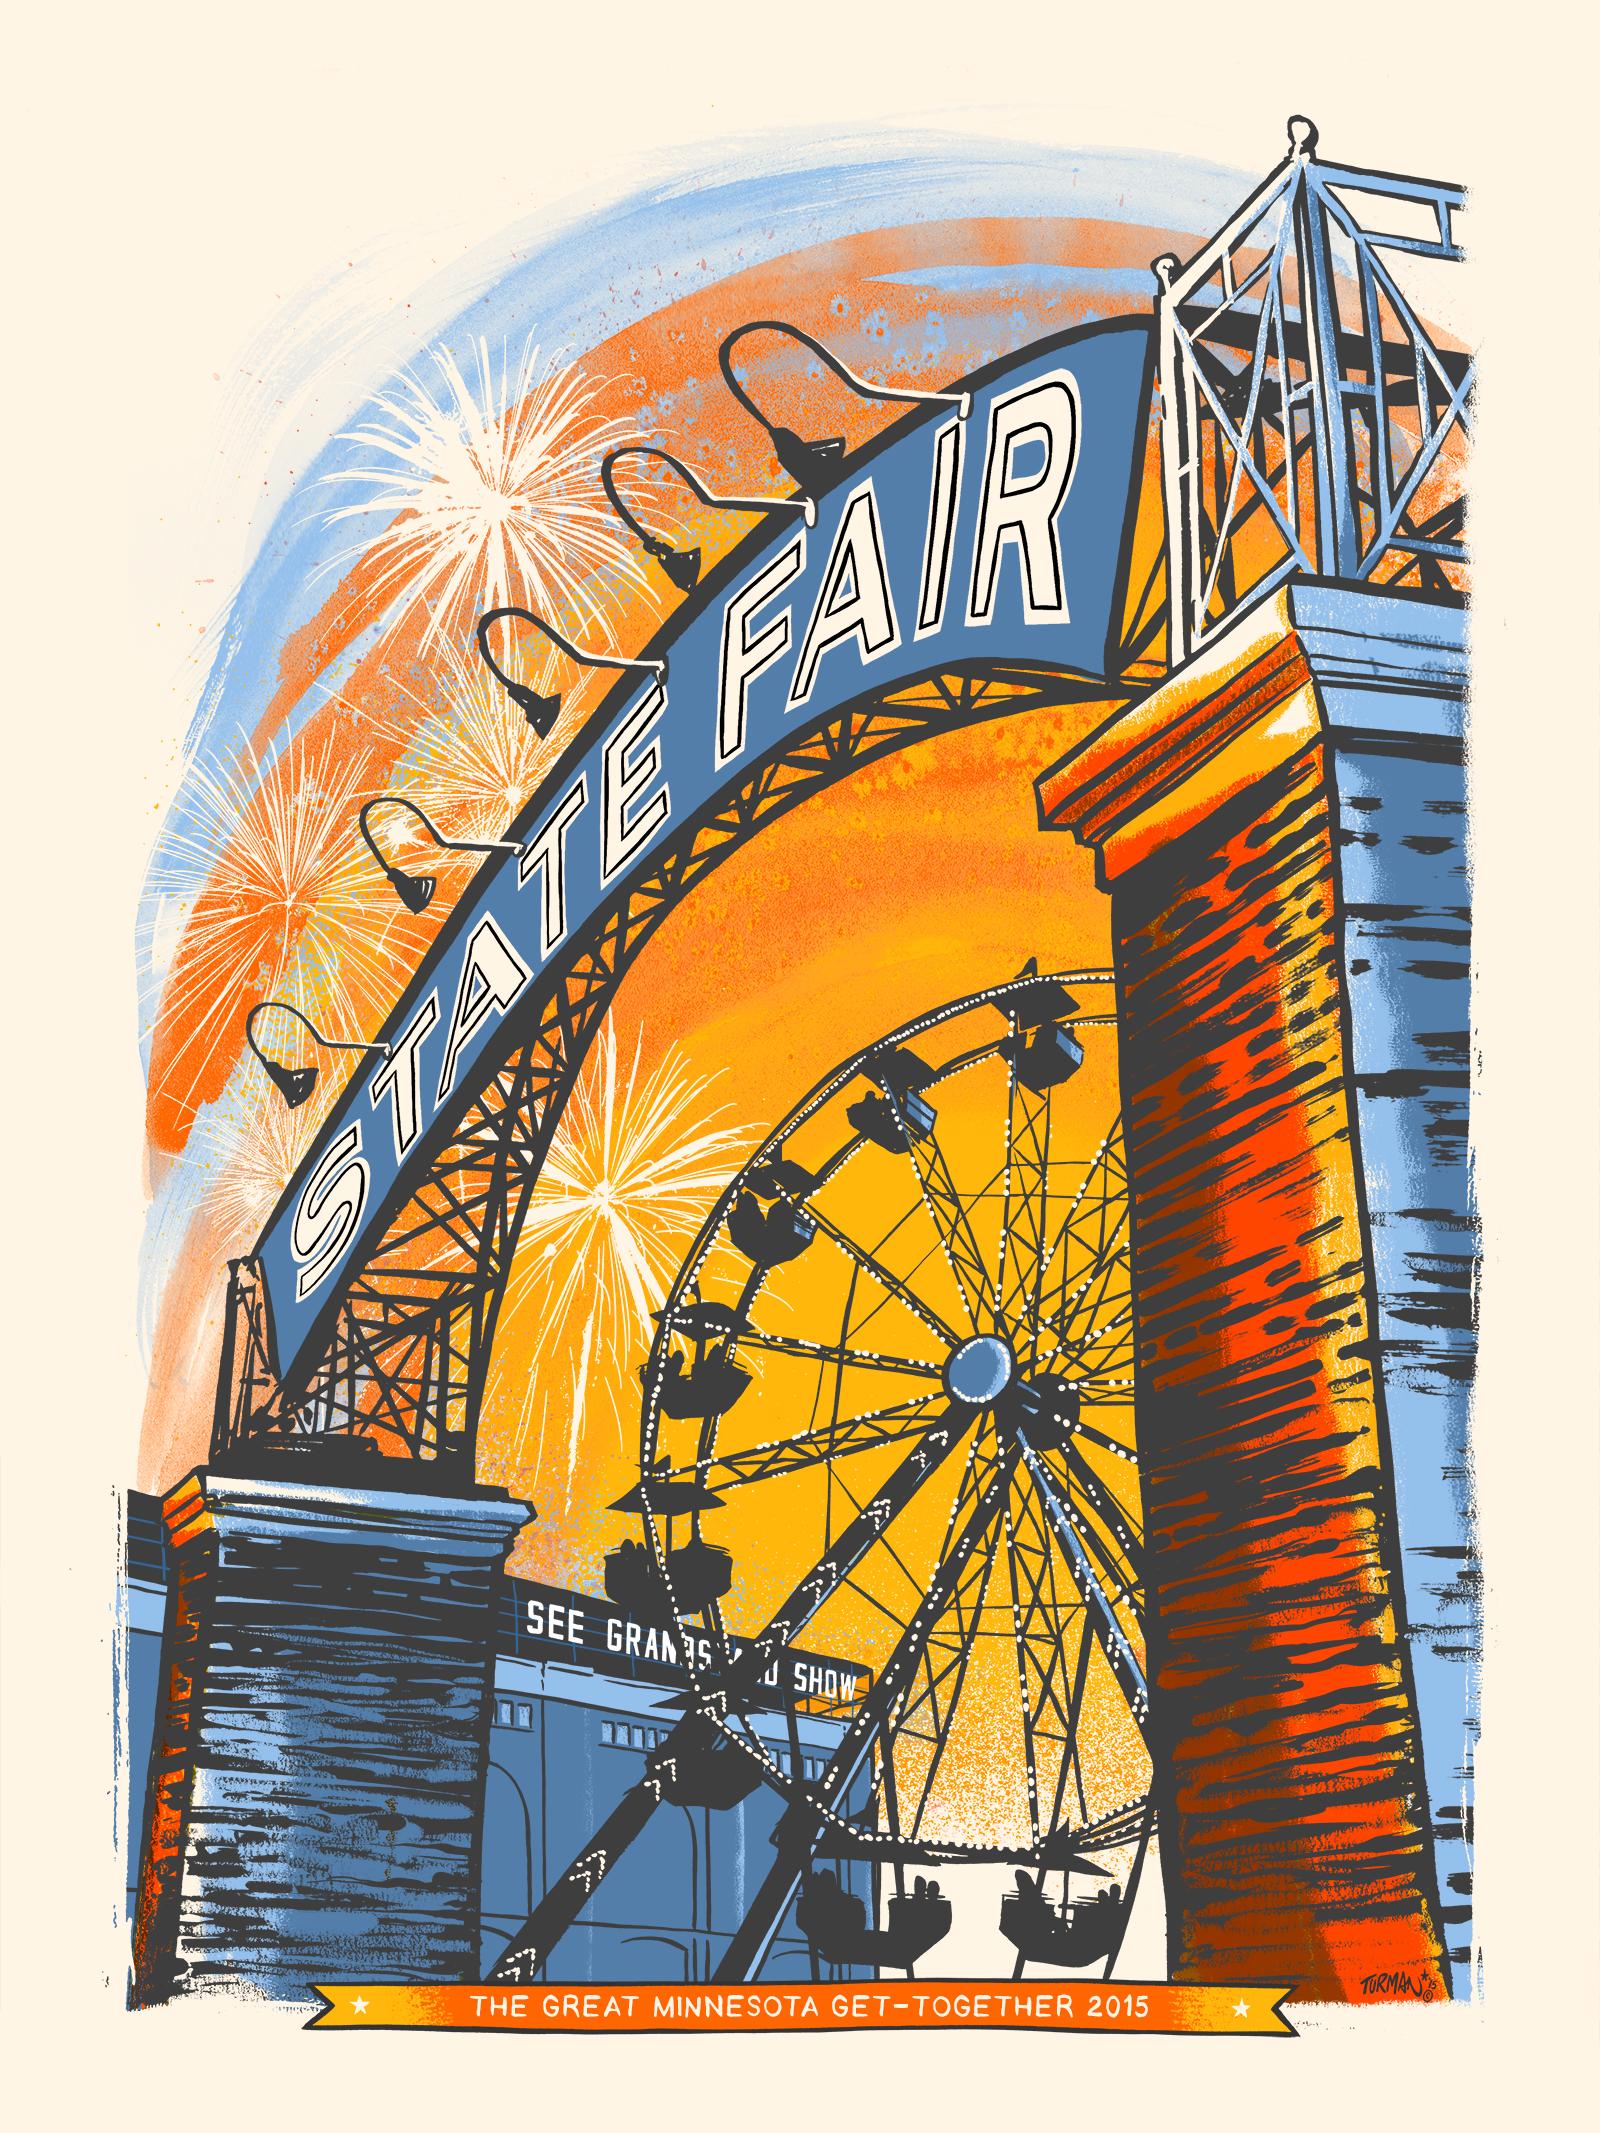 Minnesota State Fair Commemorative Art 2105 - Turman